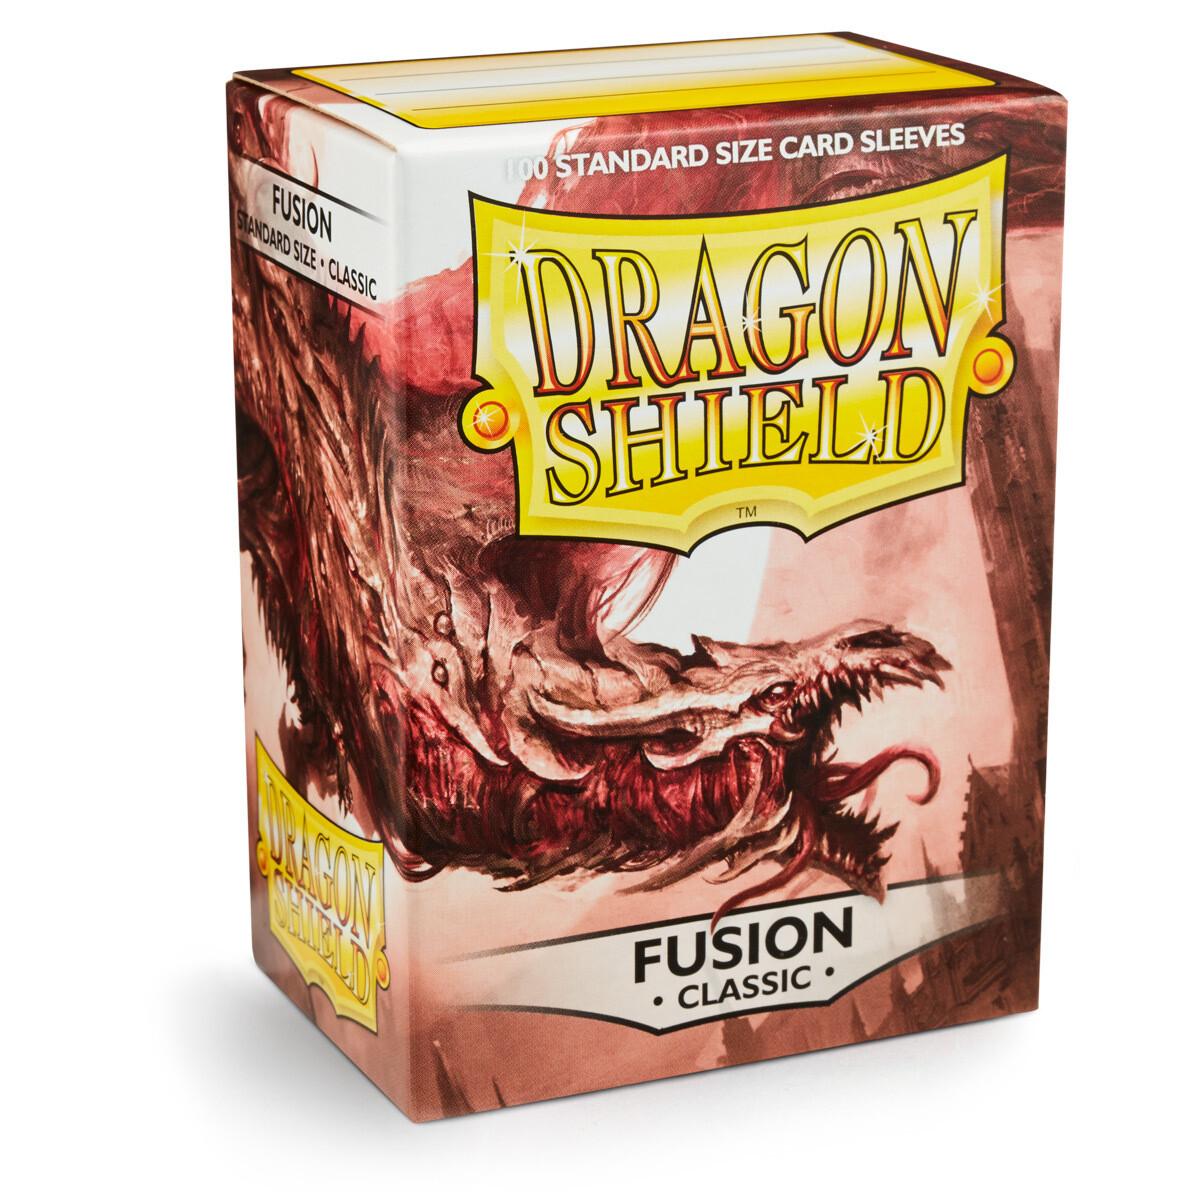 Dragon Shield 100 Sleeves - Fusion